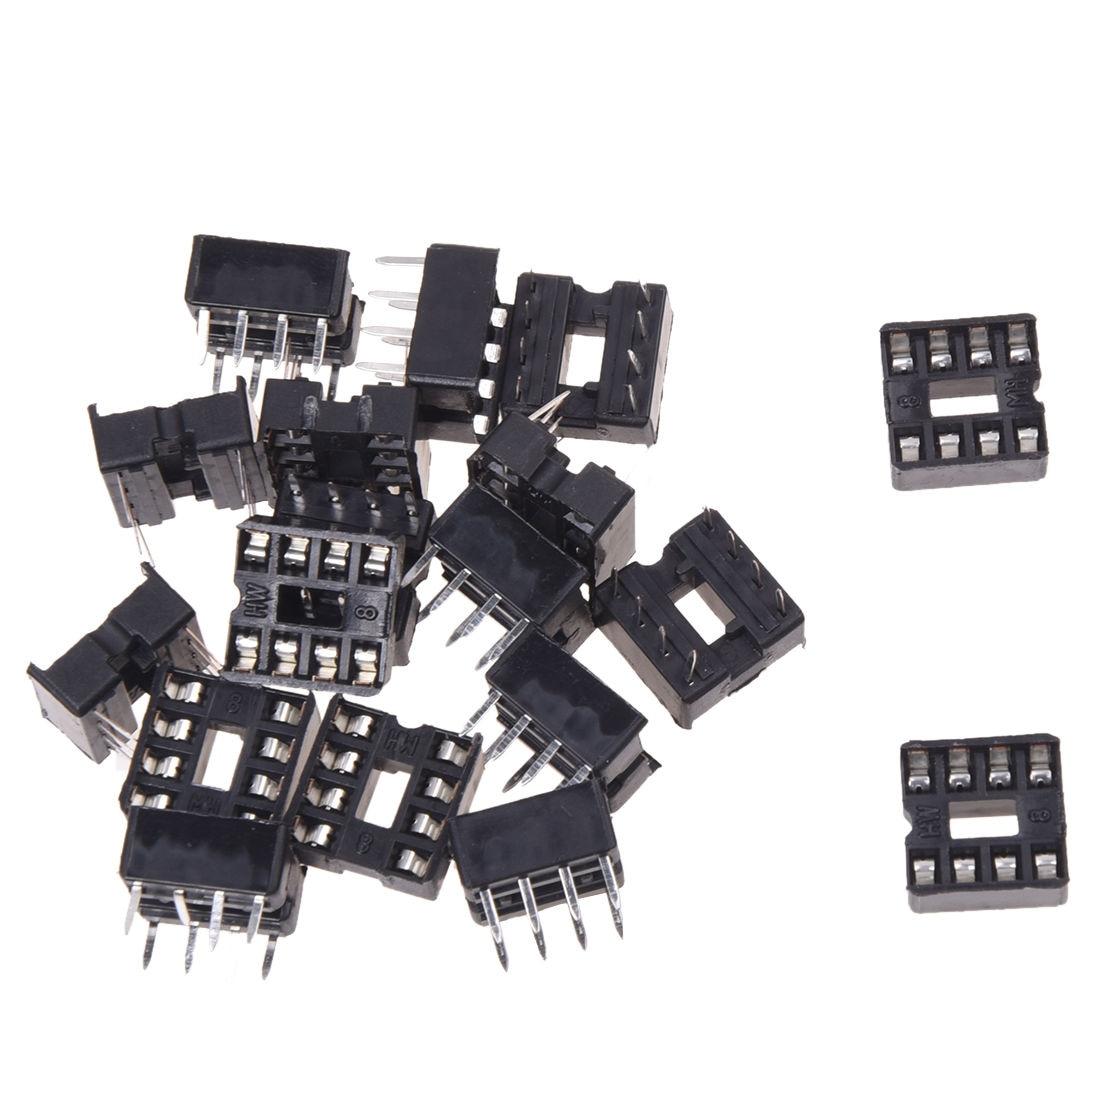 Adaptador AUTO 20x8 Pin 2,54mm paso IC enchufes tipo soldadura